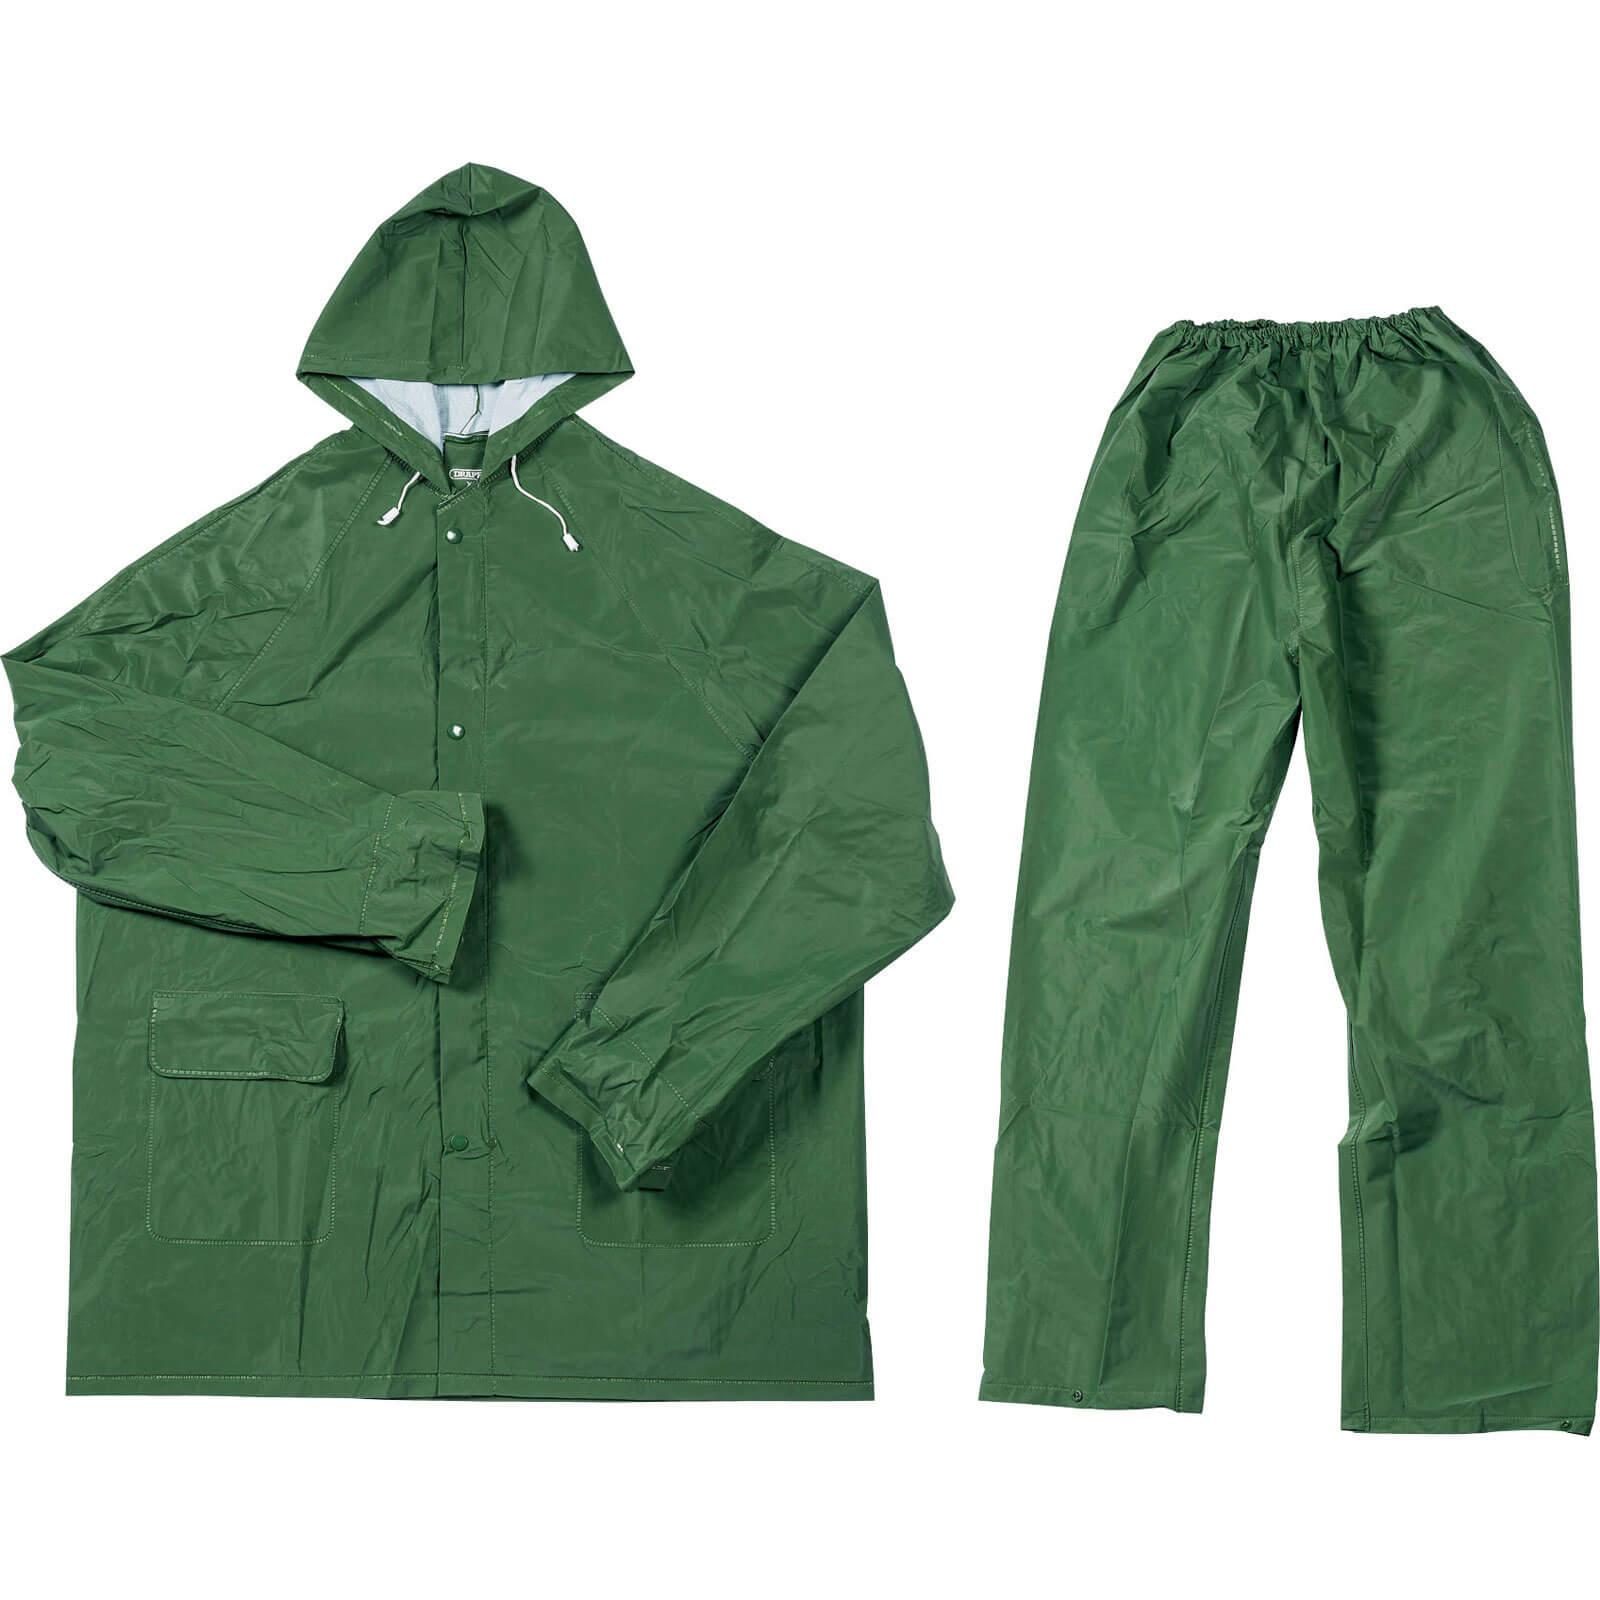 Draper 2 Piece Lightweight Rain Suit Green One Size